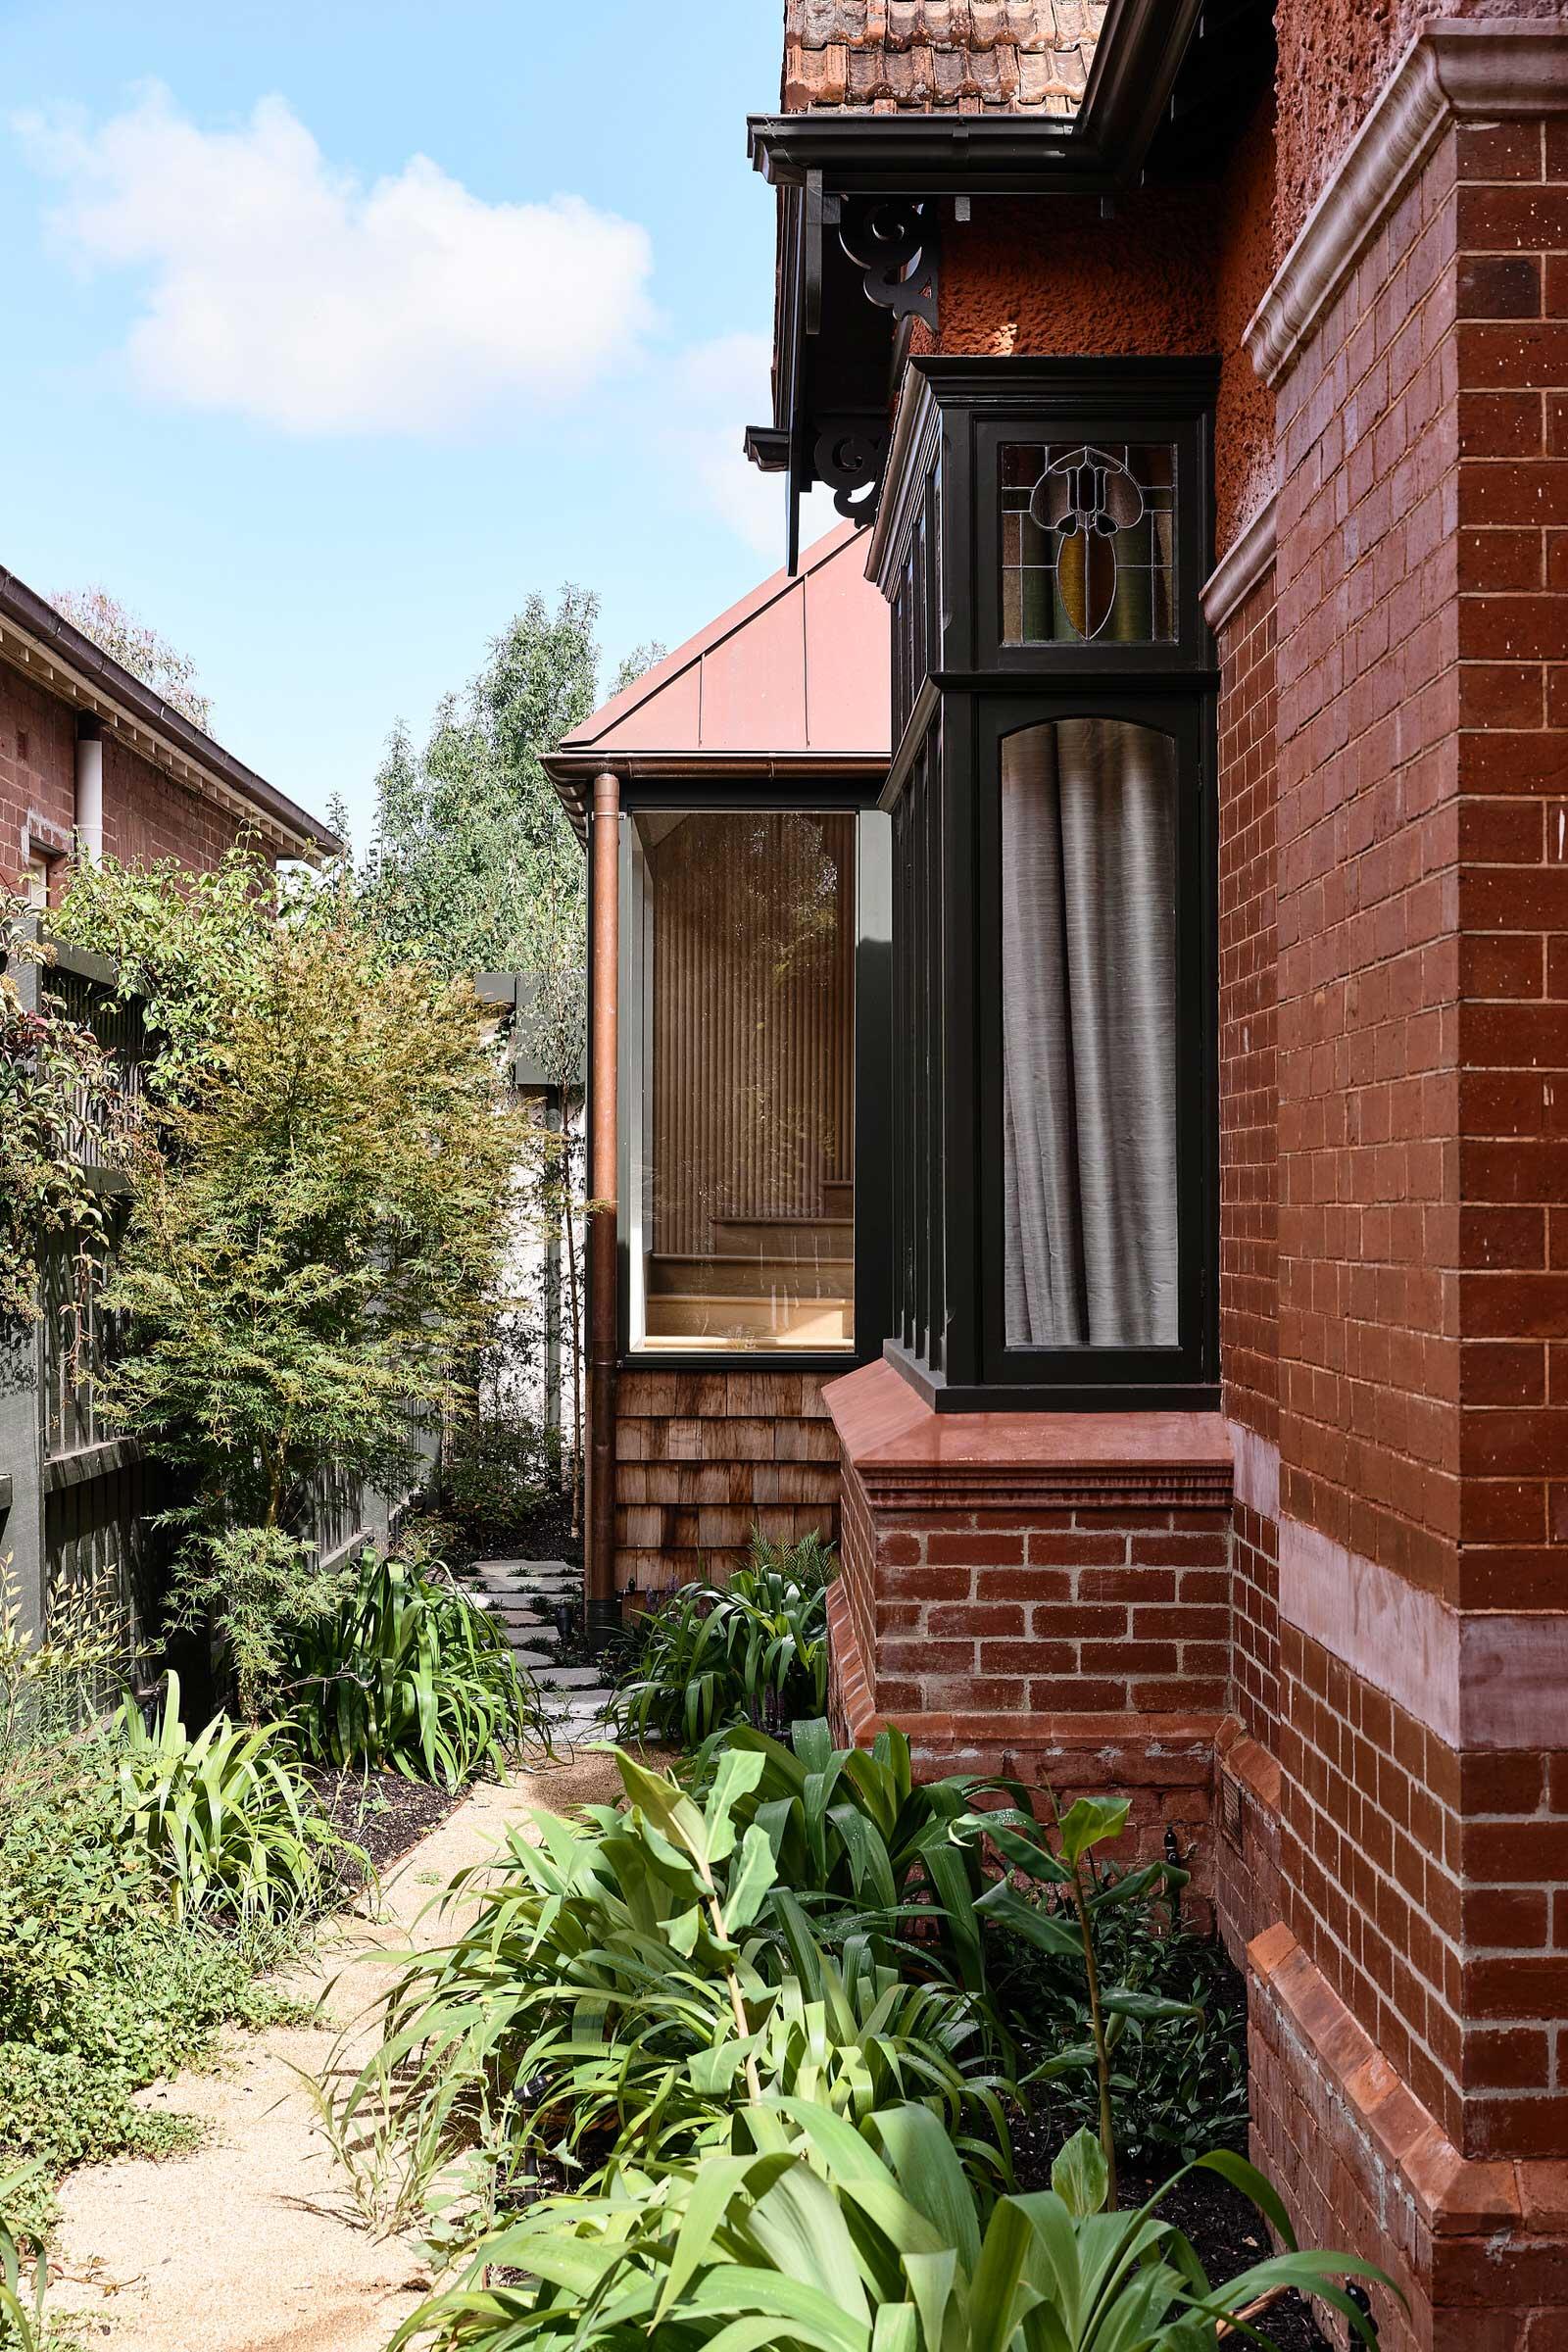 Kennedy Nolan Elsternwick House Melbourne Residential Architecture Photo Derek Swalwell Yellowtrace 02